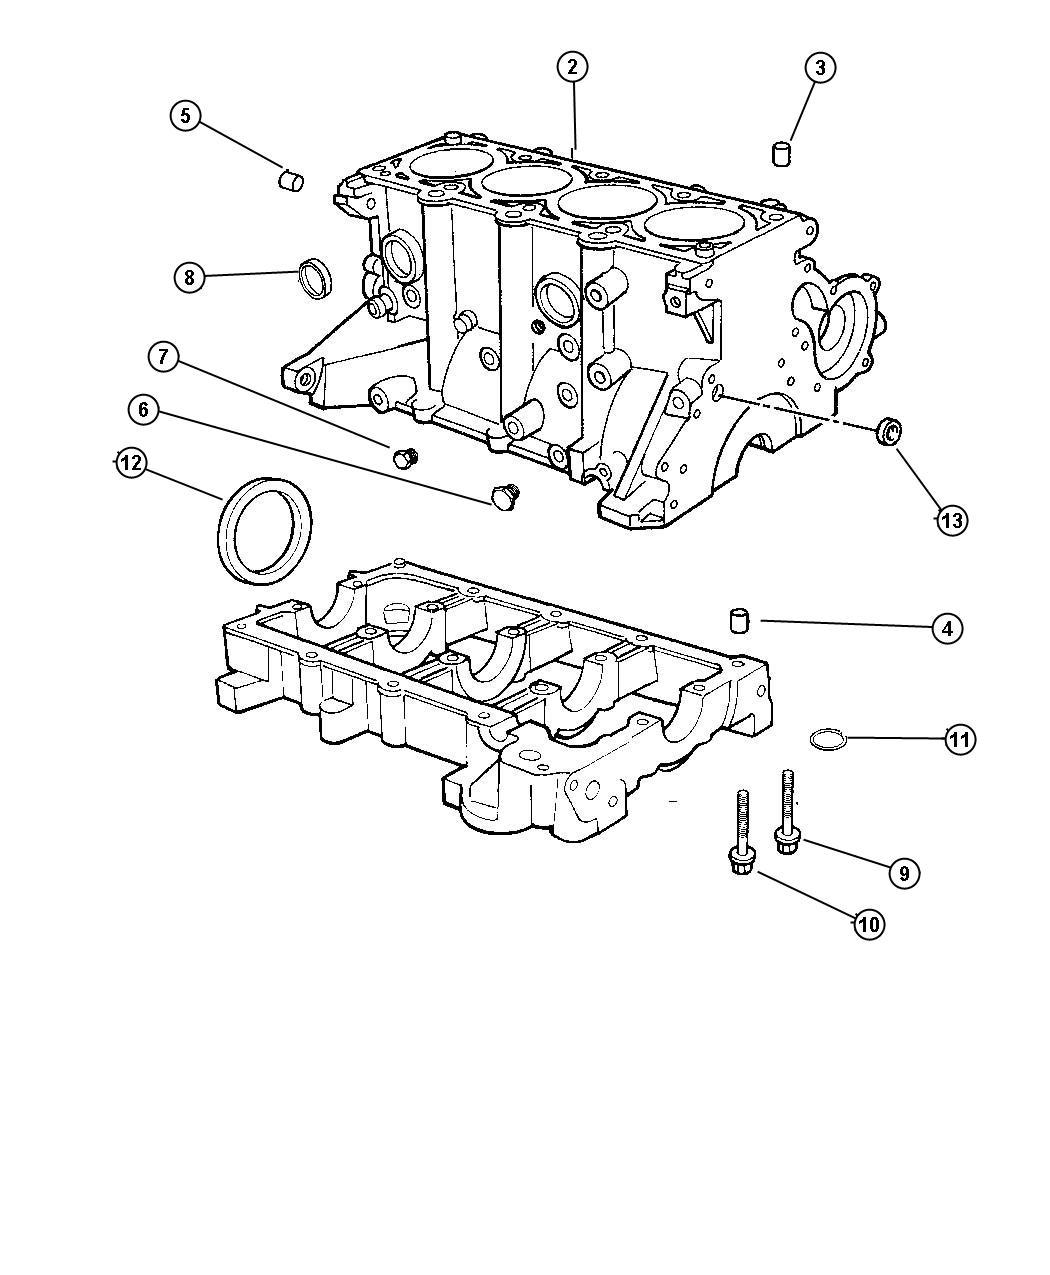 Jeep Wrangler Dowel Dowel Pin Engine Block To Bedplate